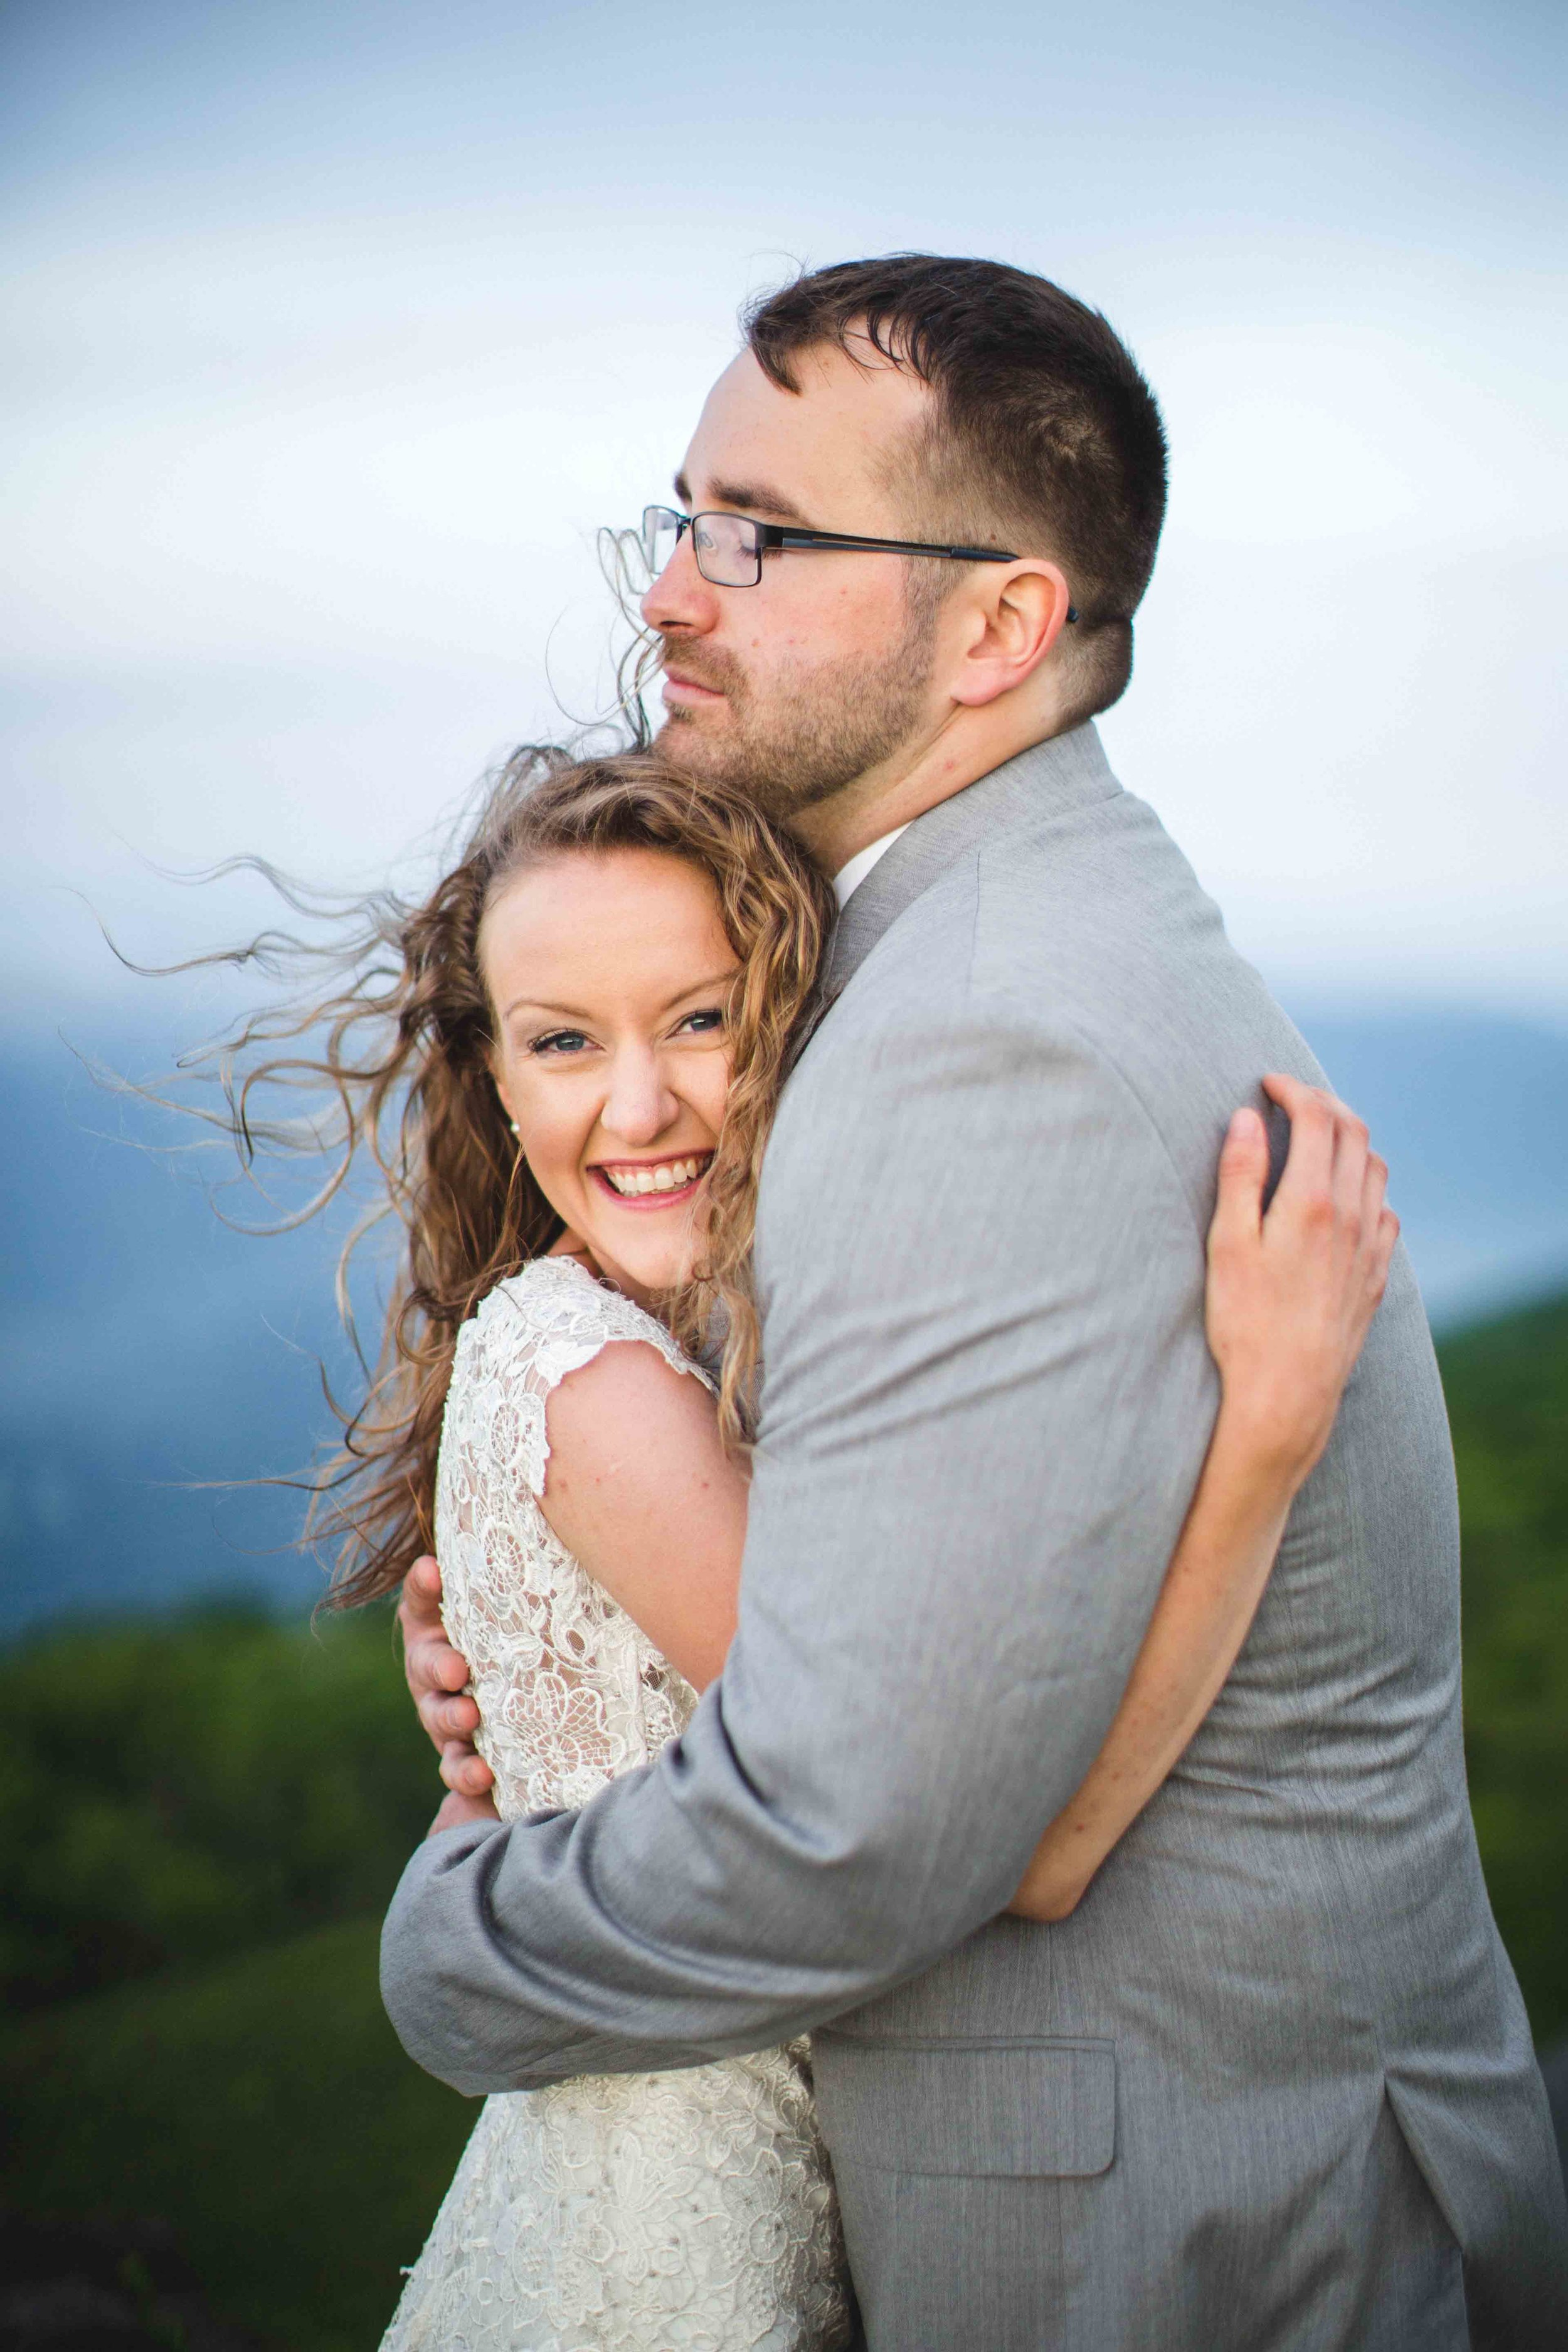 north-carolina-elopement-photographer-79.jpg